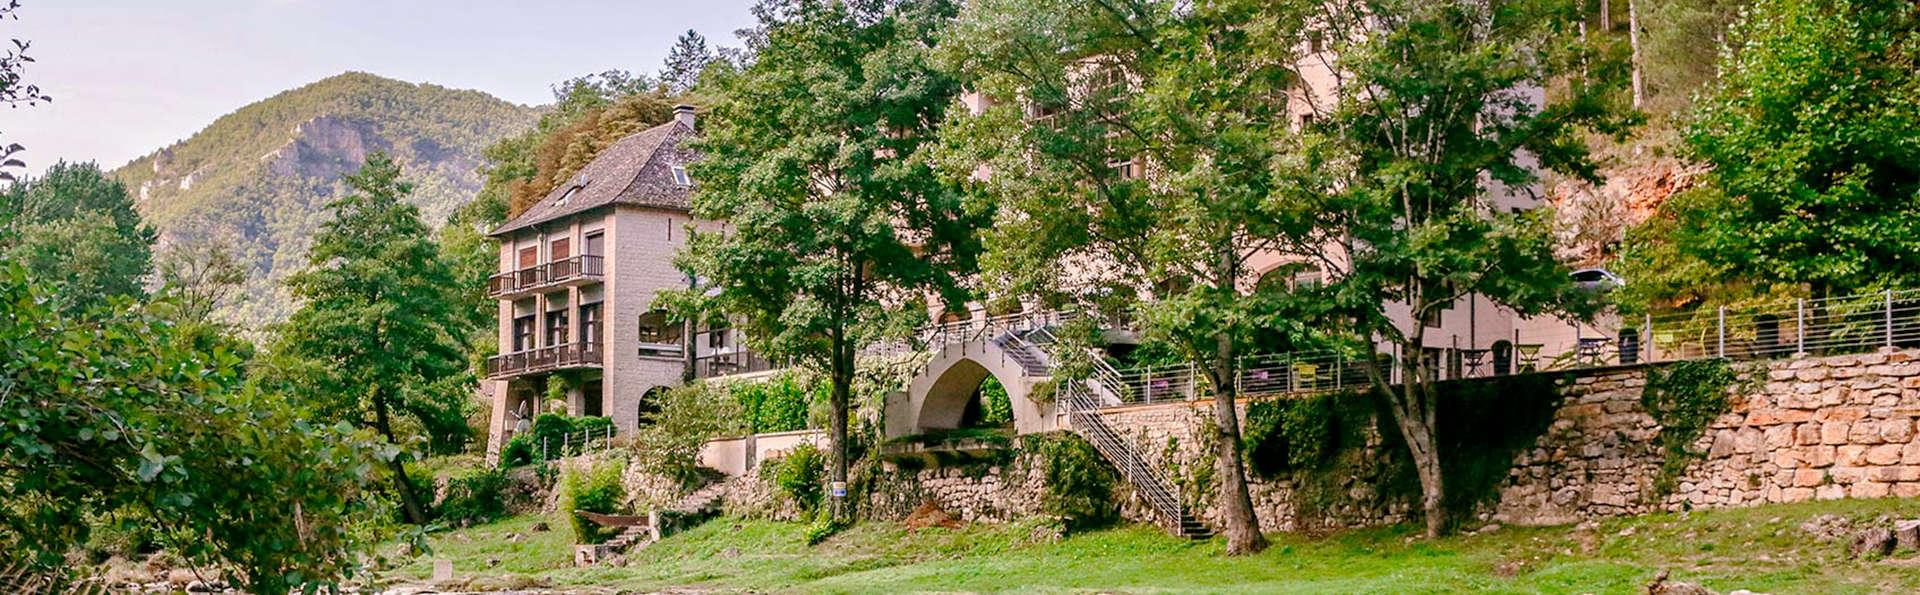 Grand Hotel de la Muse et du Rozier - EDIT_Fachada_2.jpg